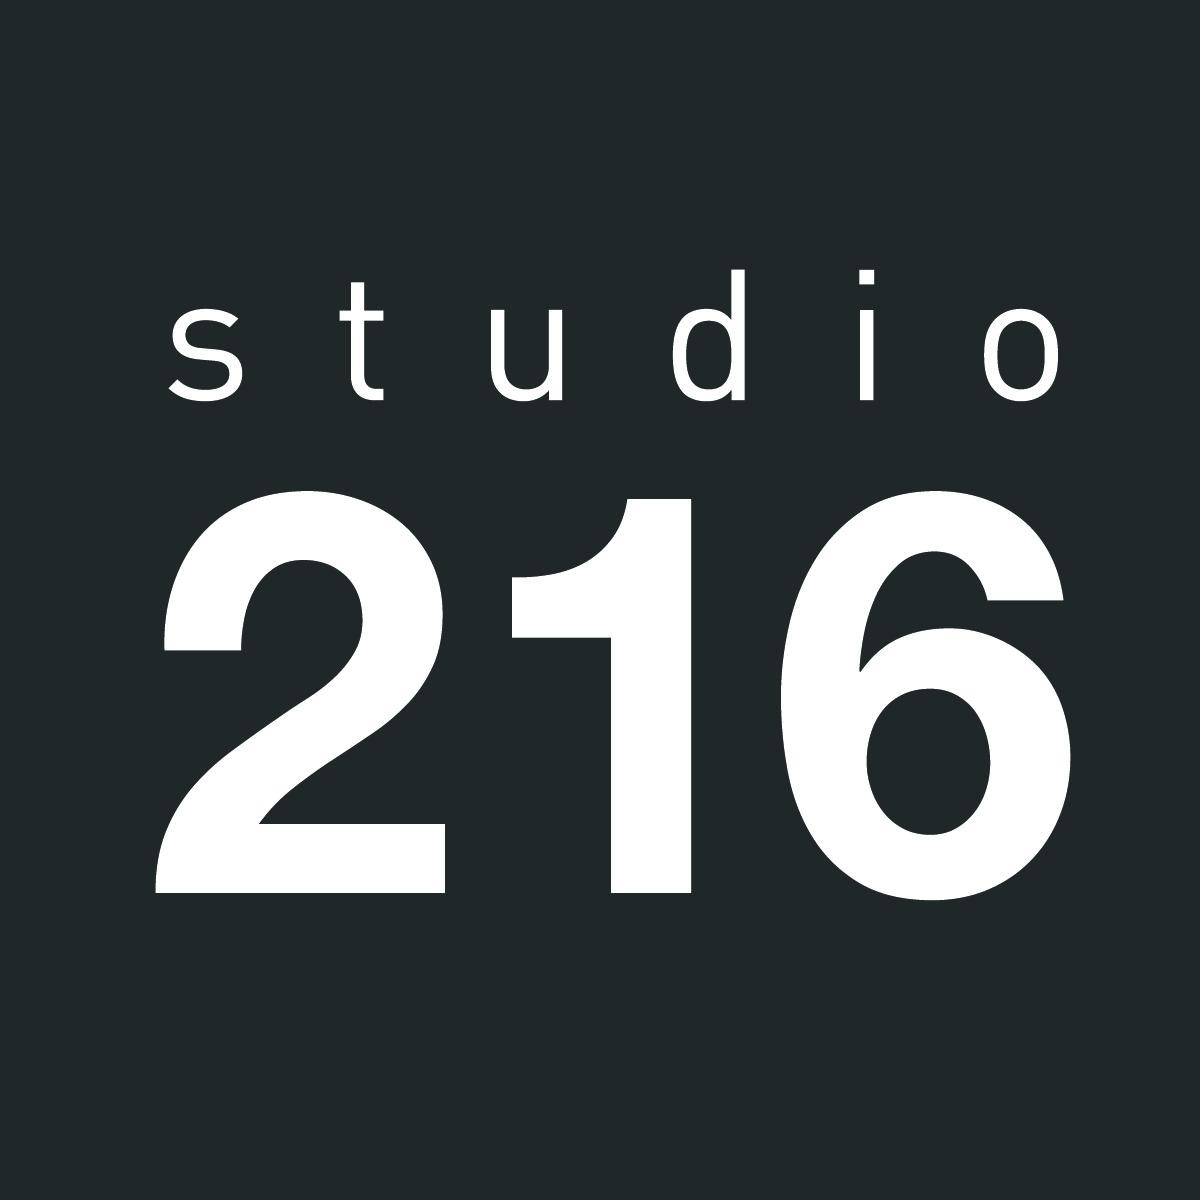 STUDIO 216 logo